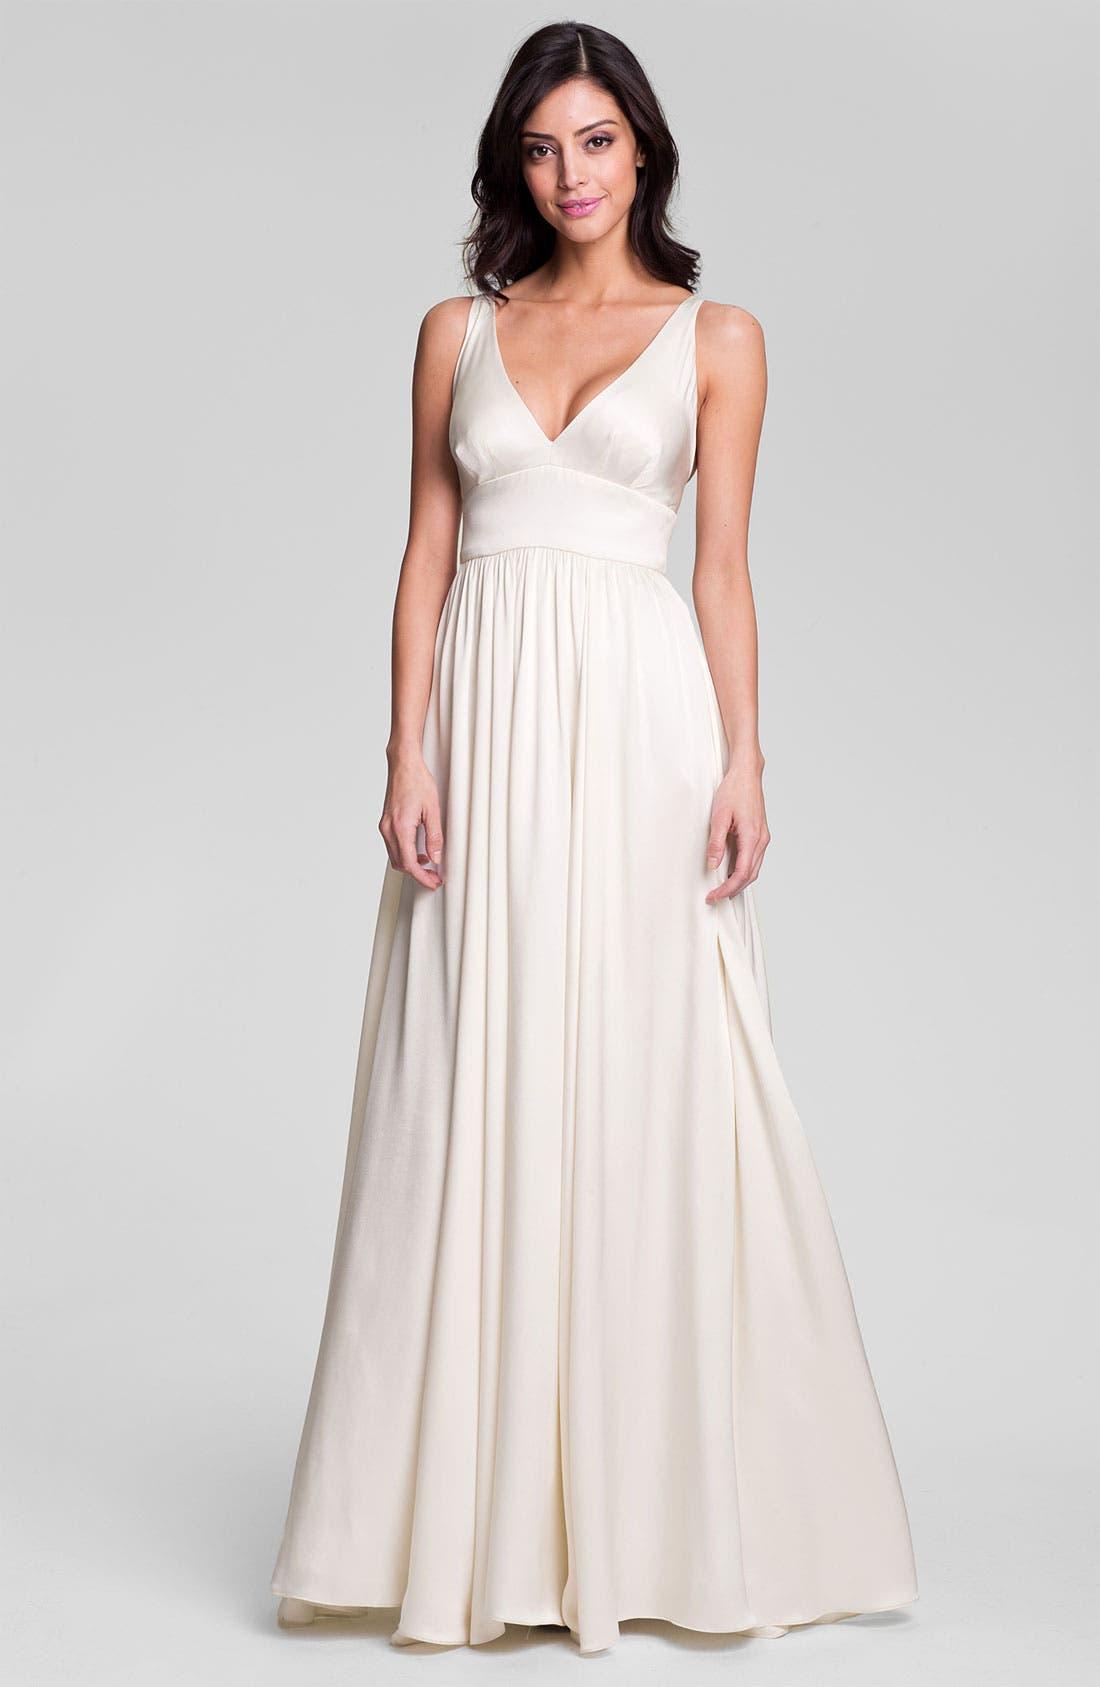 Alternate Image 1 Selected - Nicole Miller 'Elizabeth' Crisscrossed Back Silk A-Line Gown